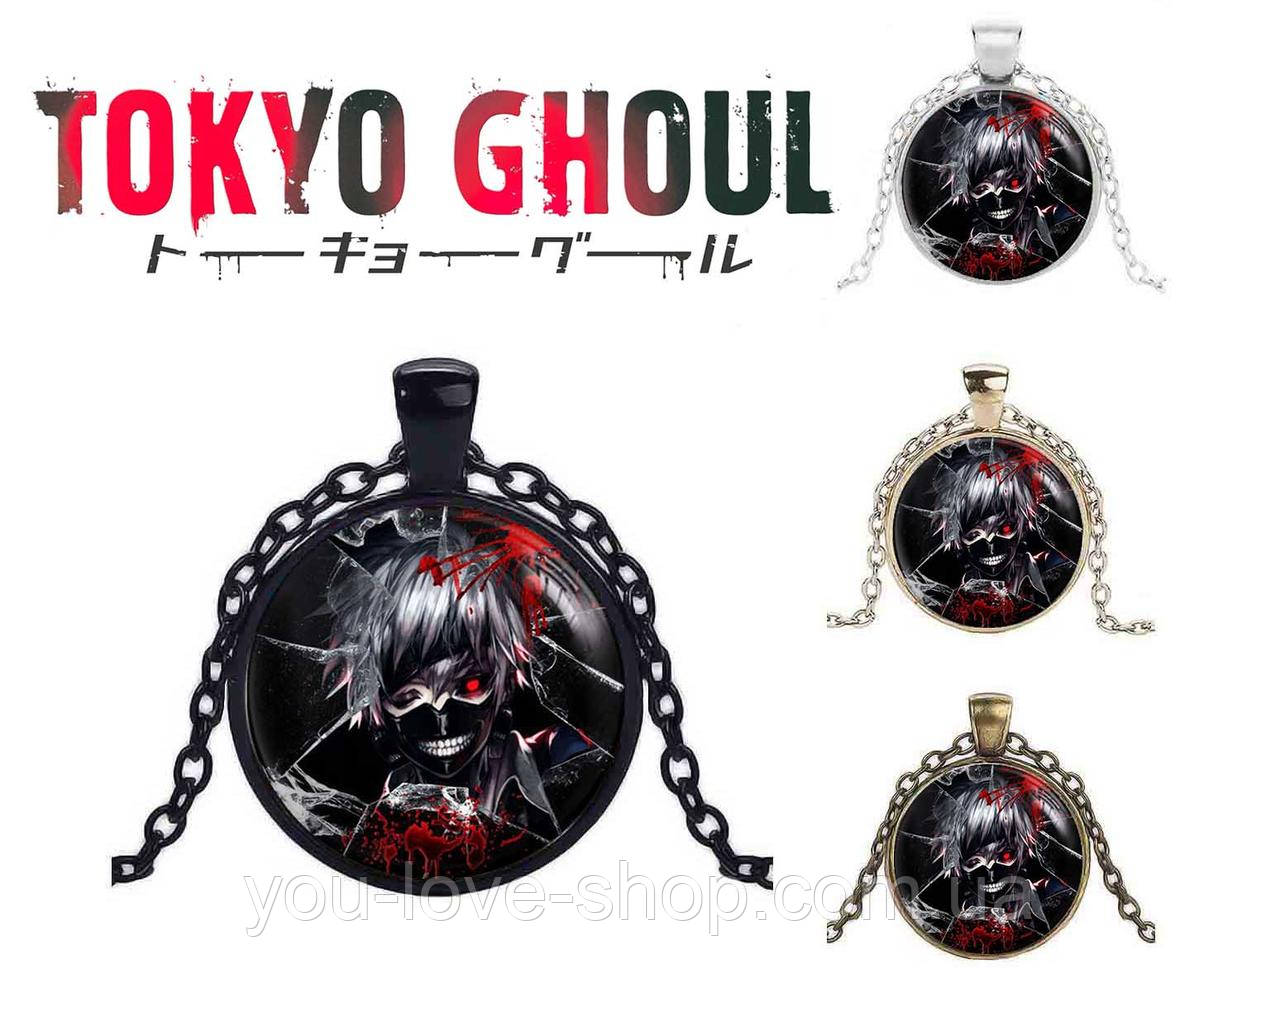 Кулон разбитое стекло Токийский гуль  / Tokyo Ghoul